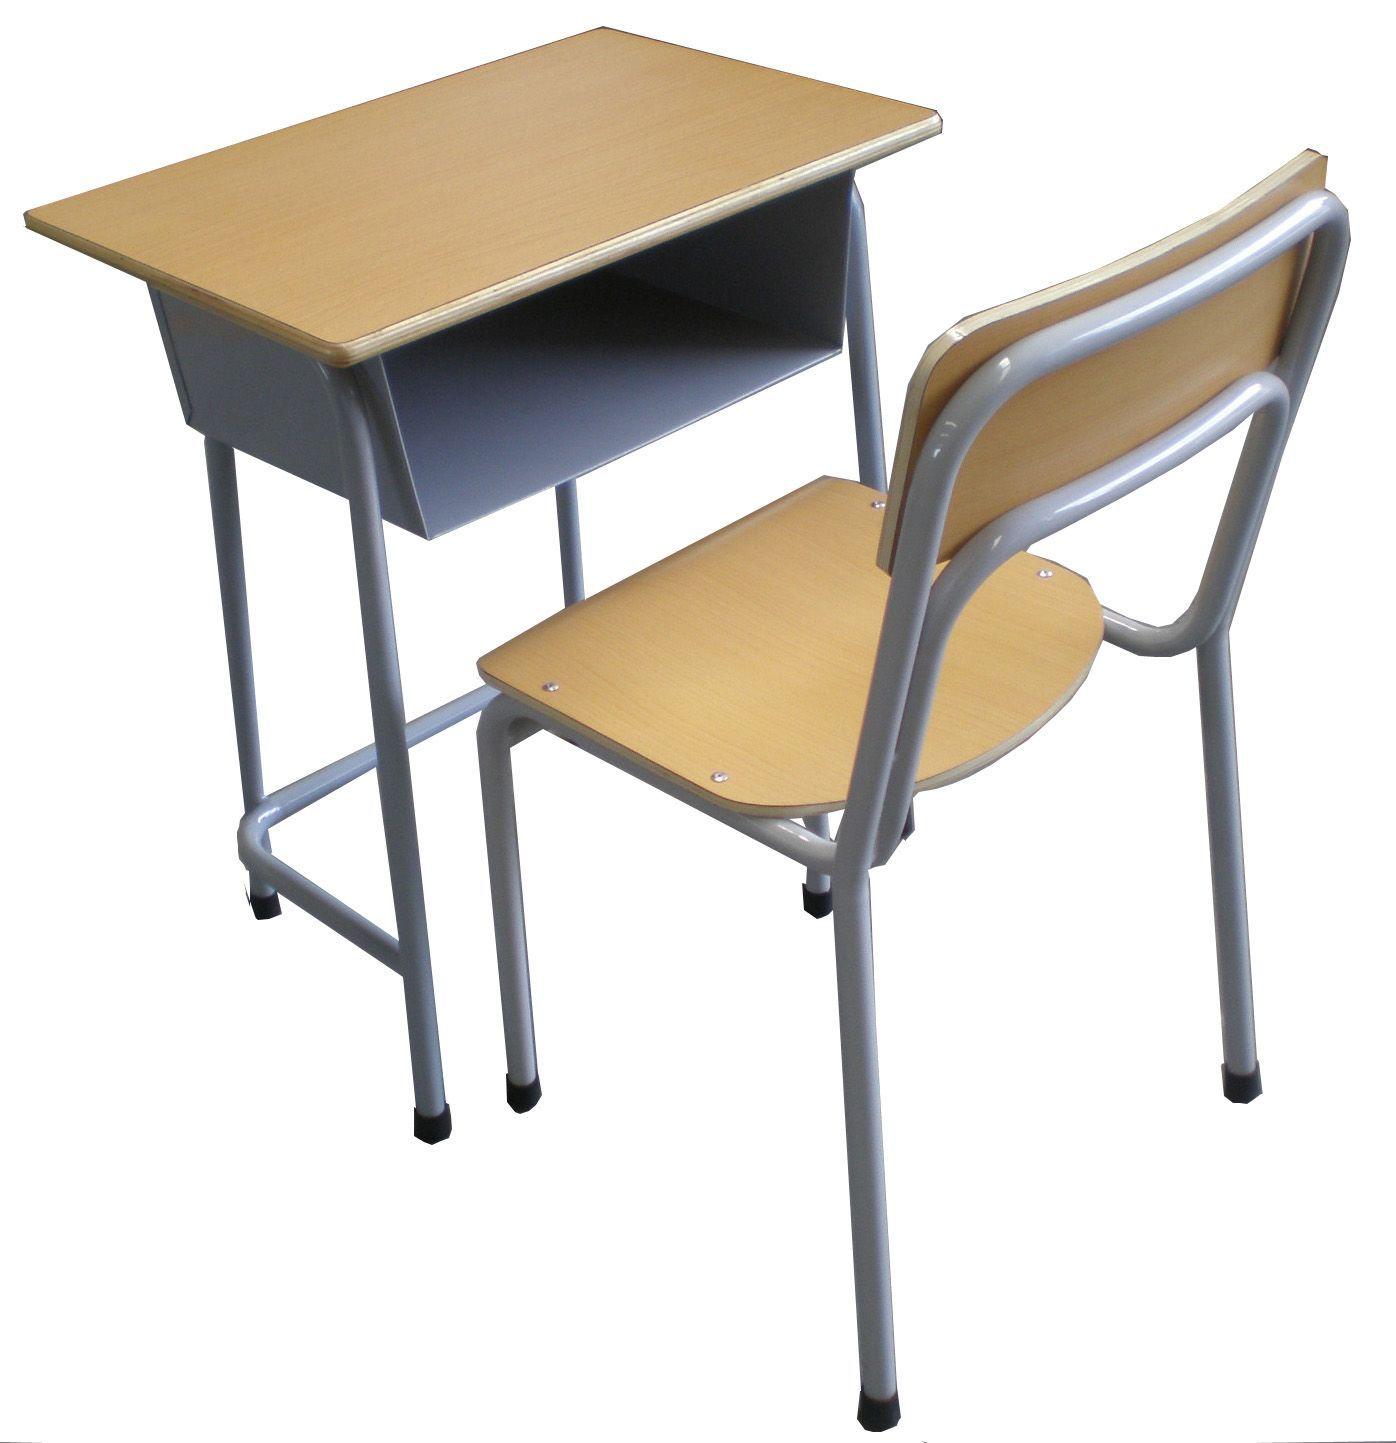 Beautiful Desku003dNegative The Desk Symbolizes A Barrier. Mrs. Price Put The Sweater On